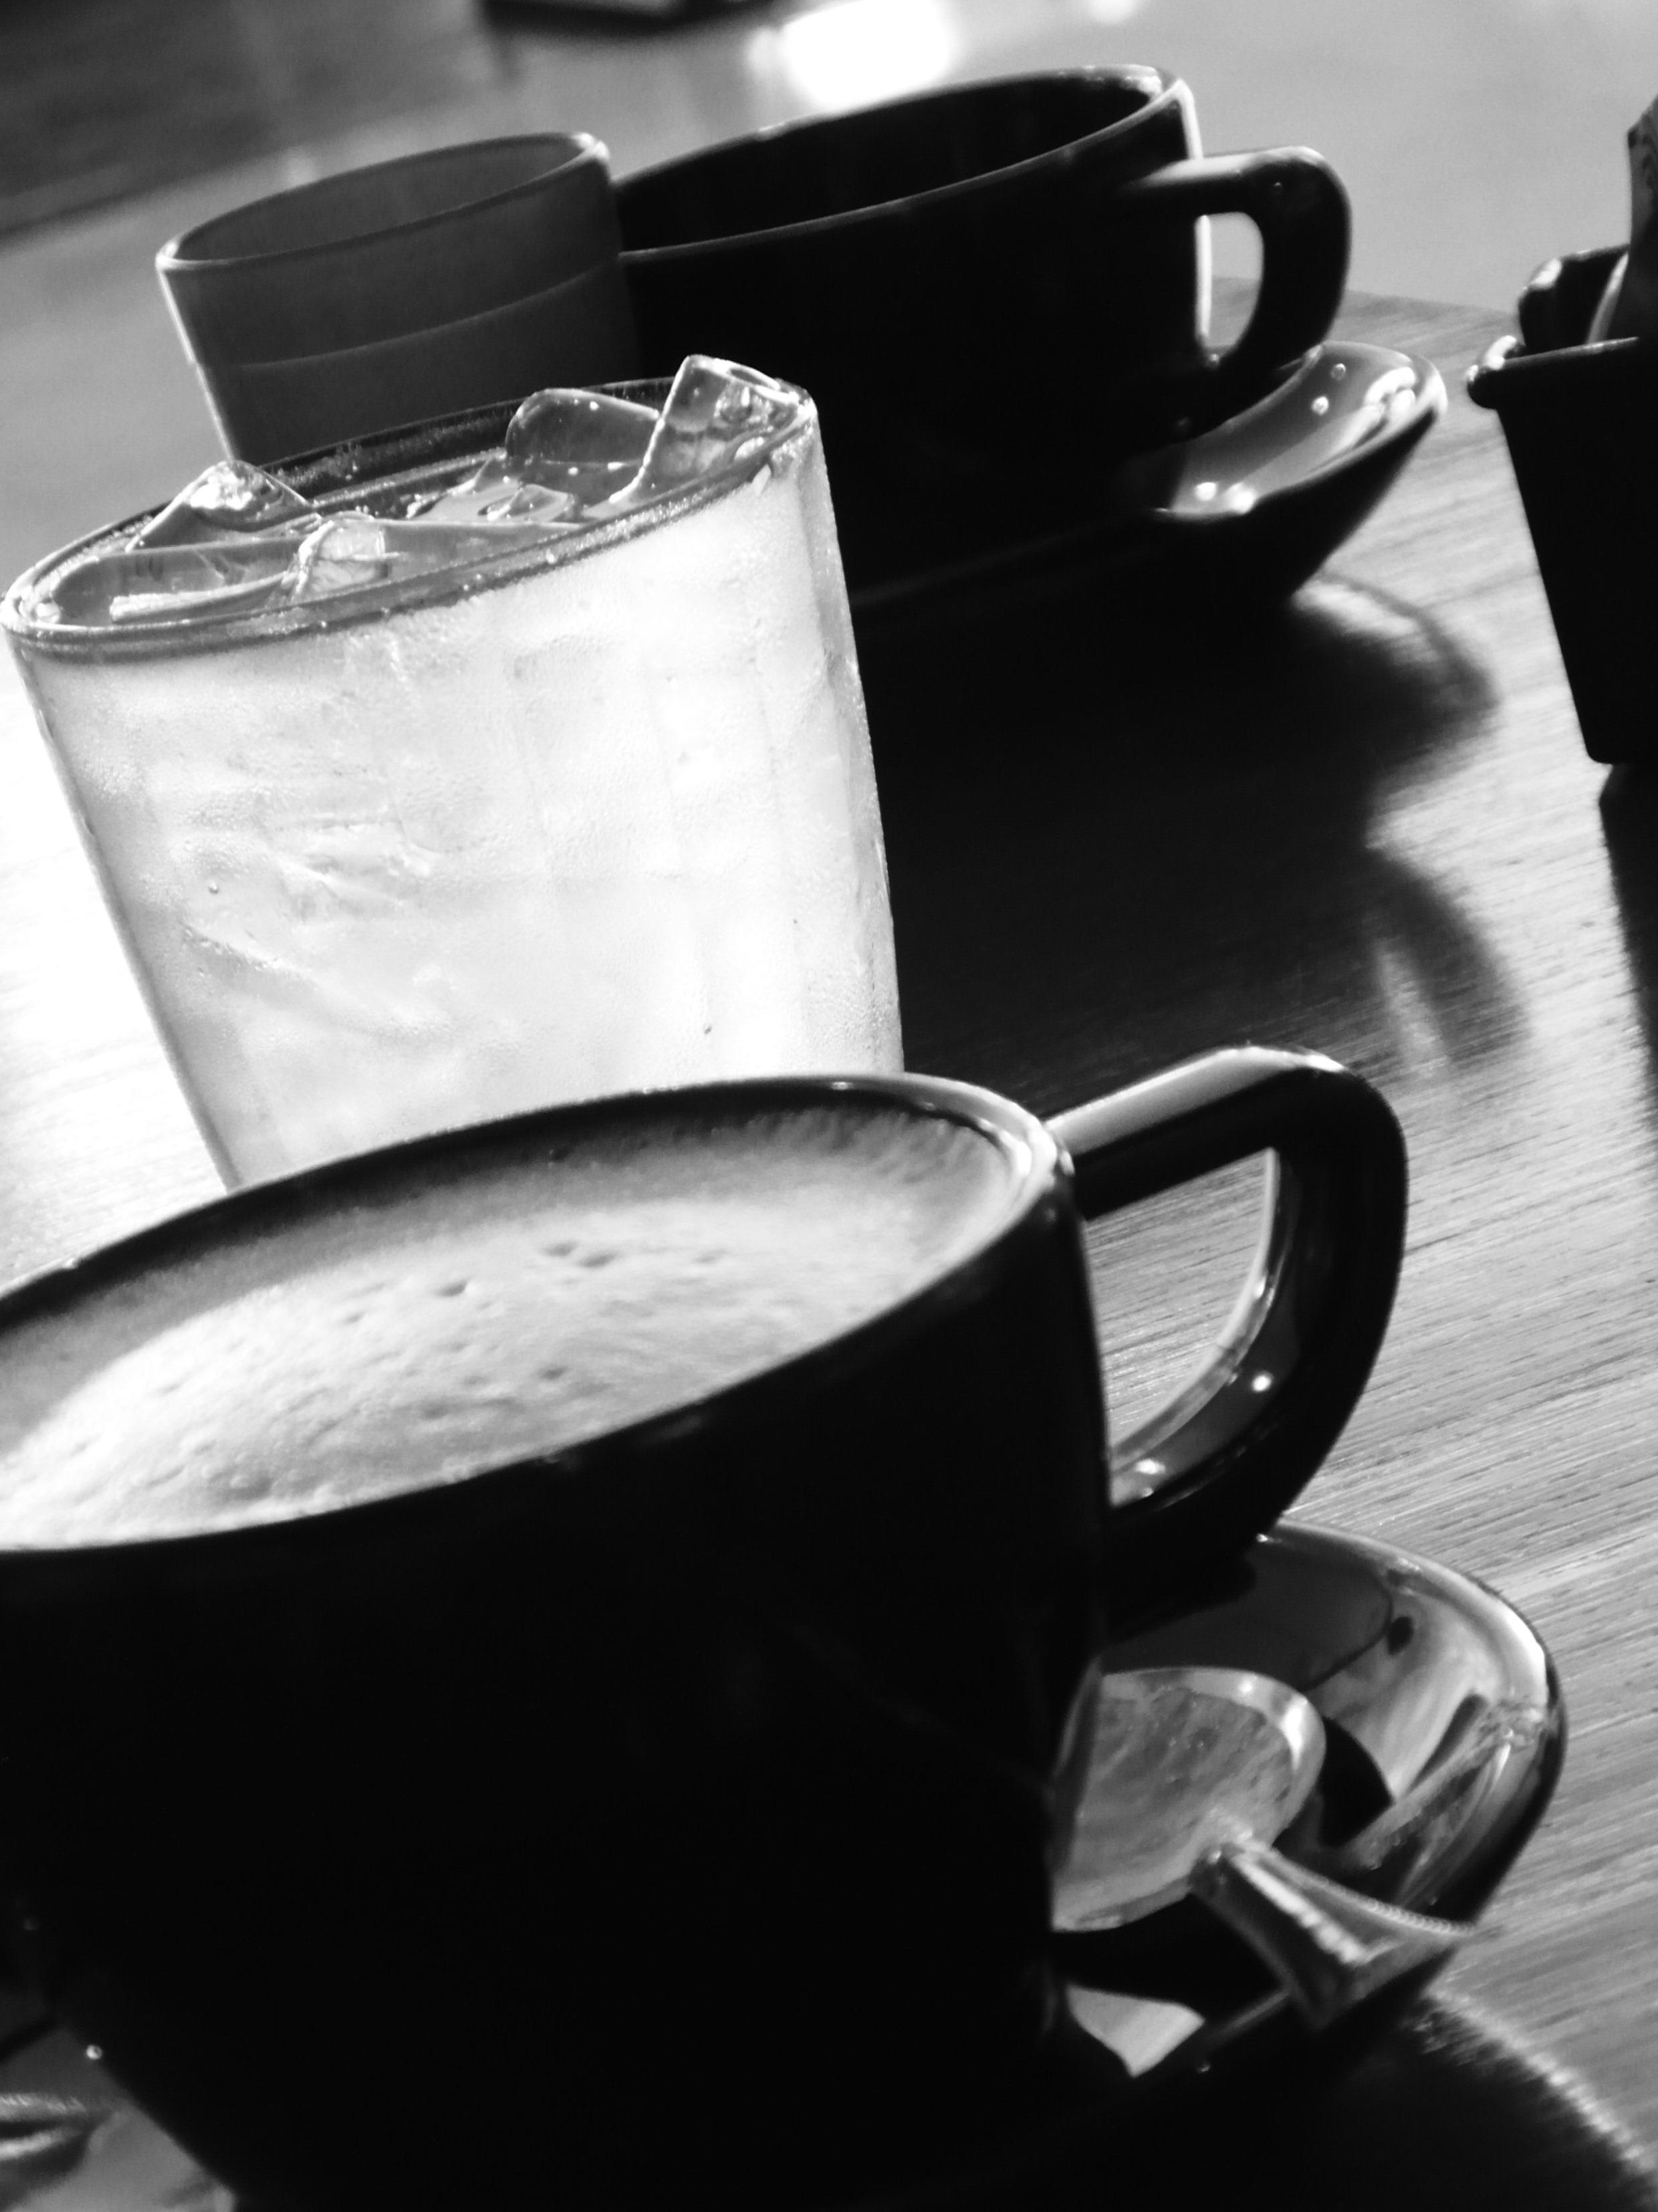 Black coffee cups b&w image photo